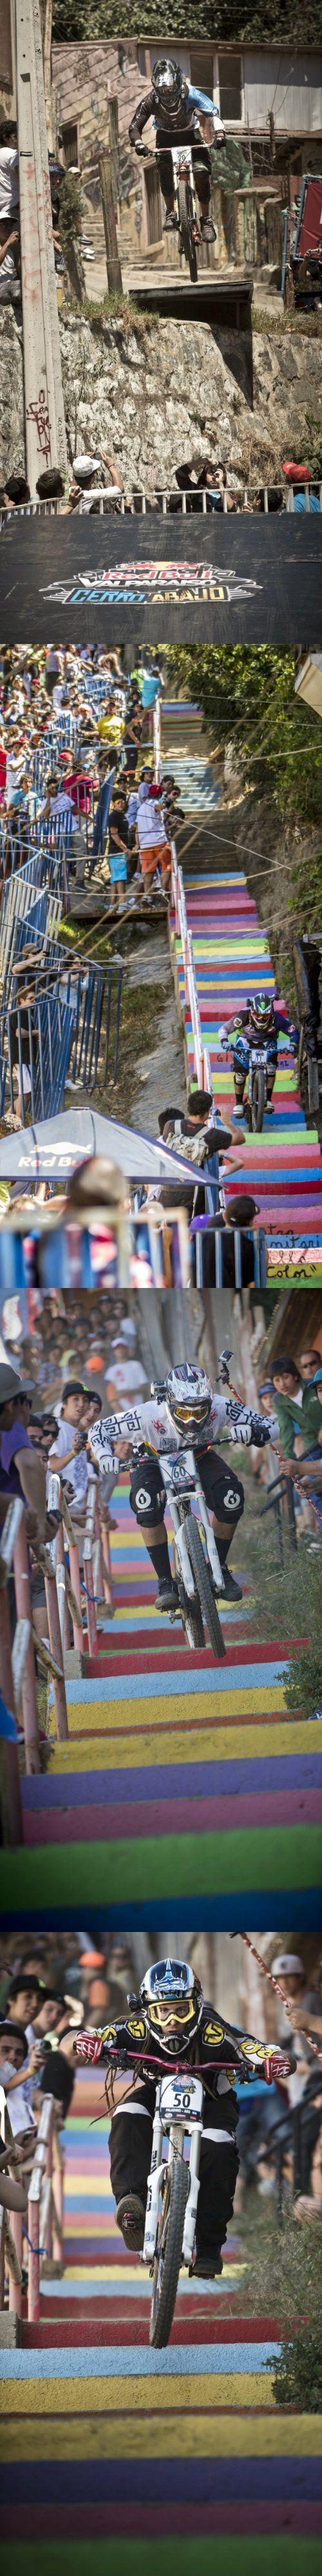 A colorful race #mtb #downhill #valparaiso